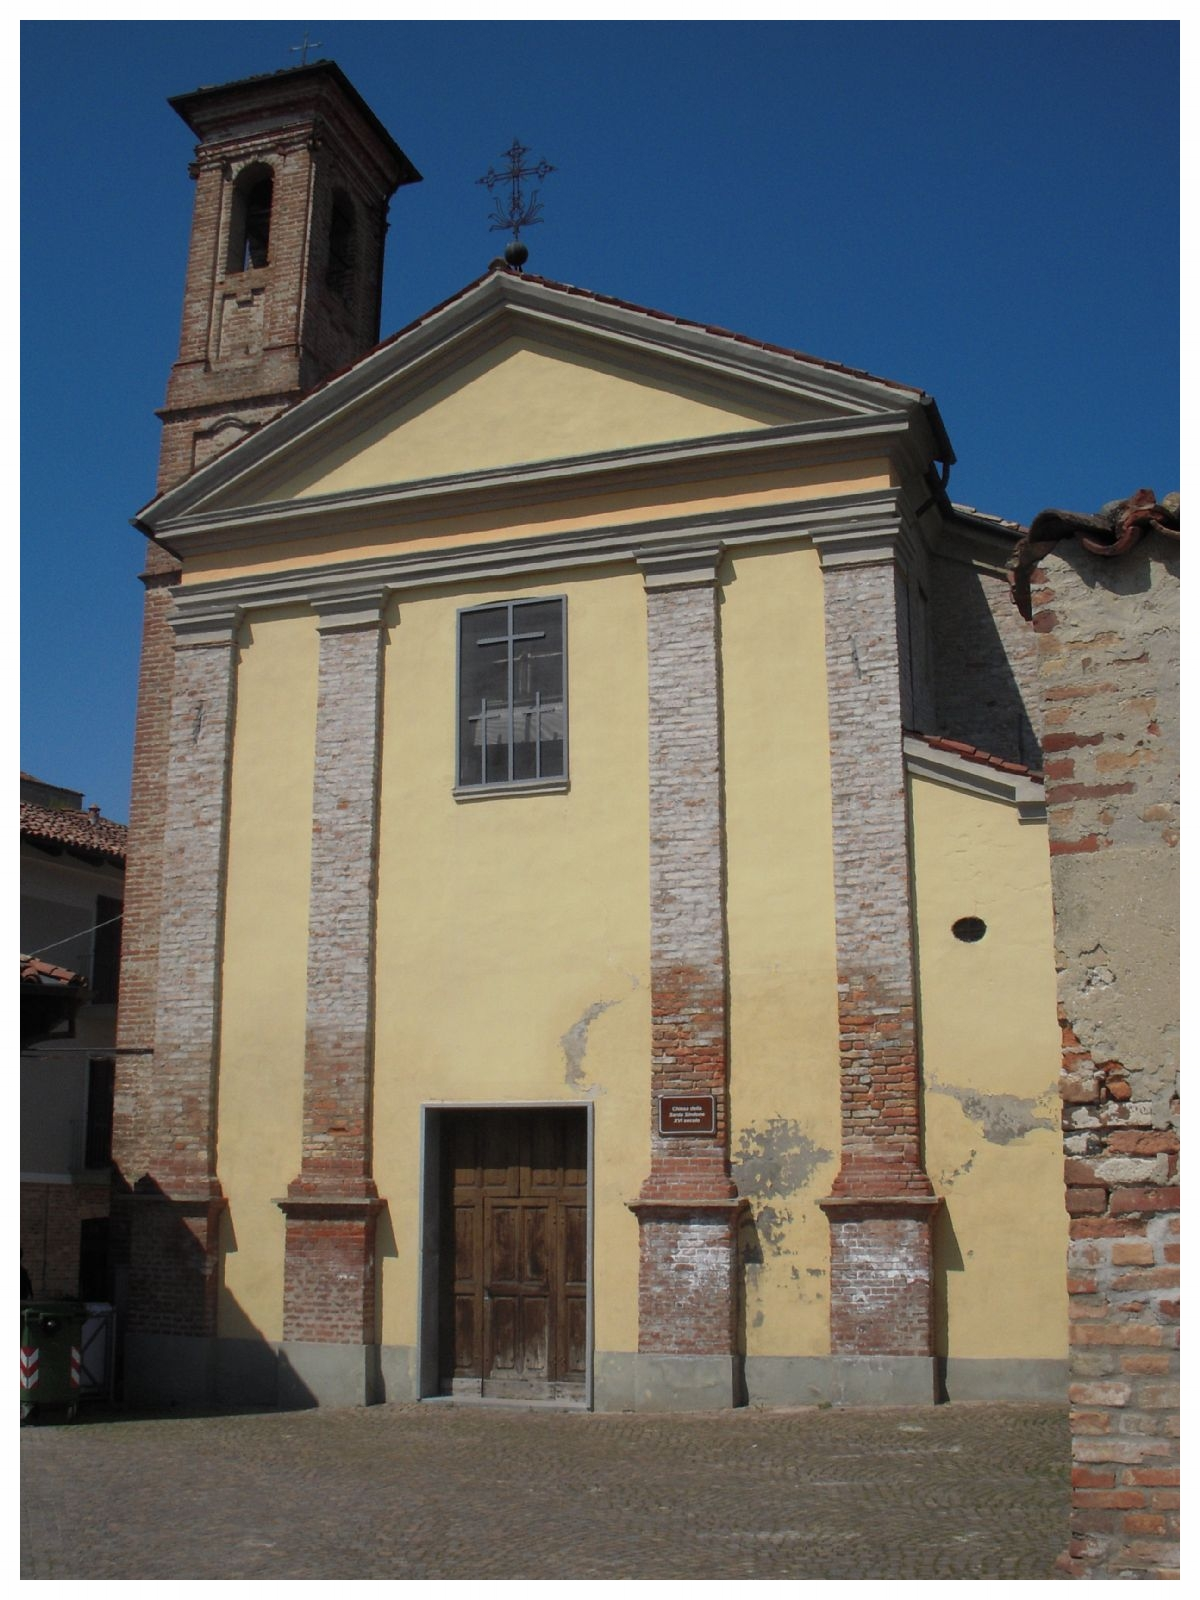 castellinaldo comune langhe e roero piemonte turismo in langa tour delle langhe vini piemonte cucina piemontese visitare le langhe chiesa della confraternita.jpeg